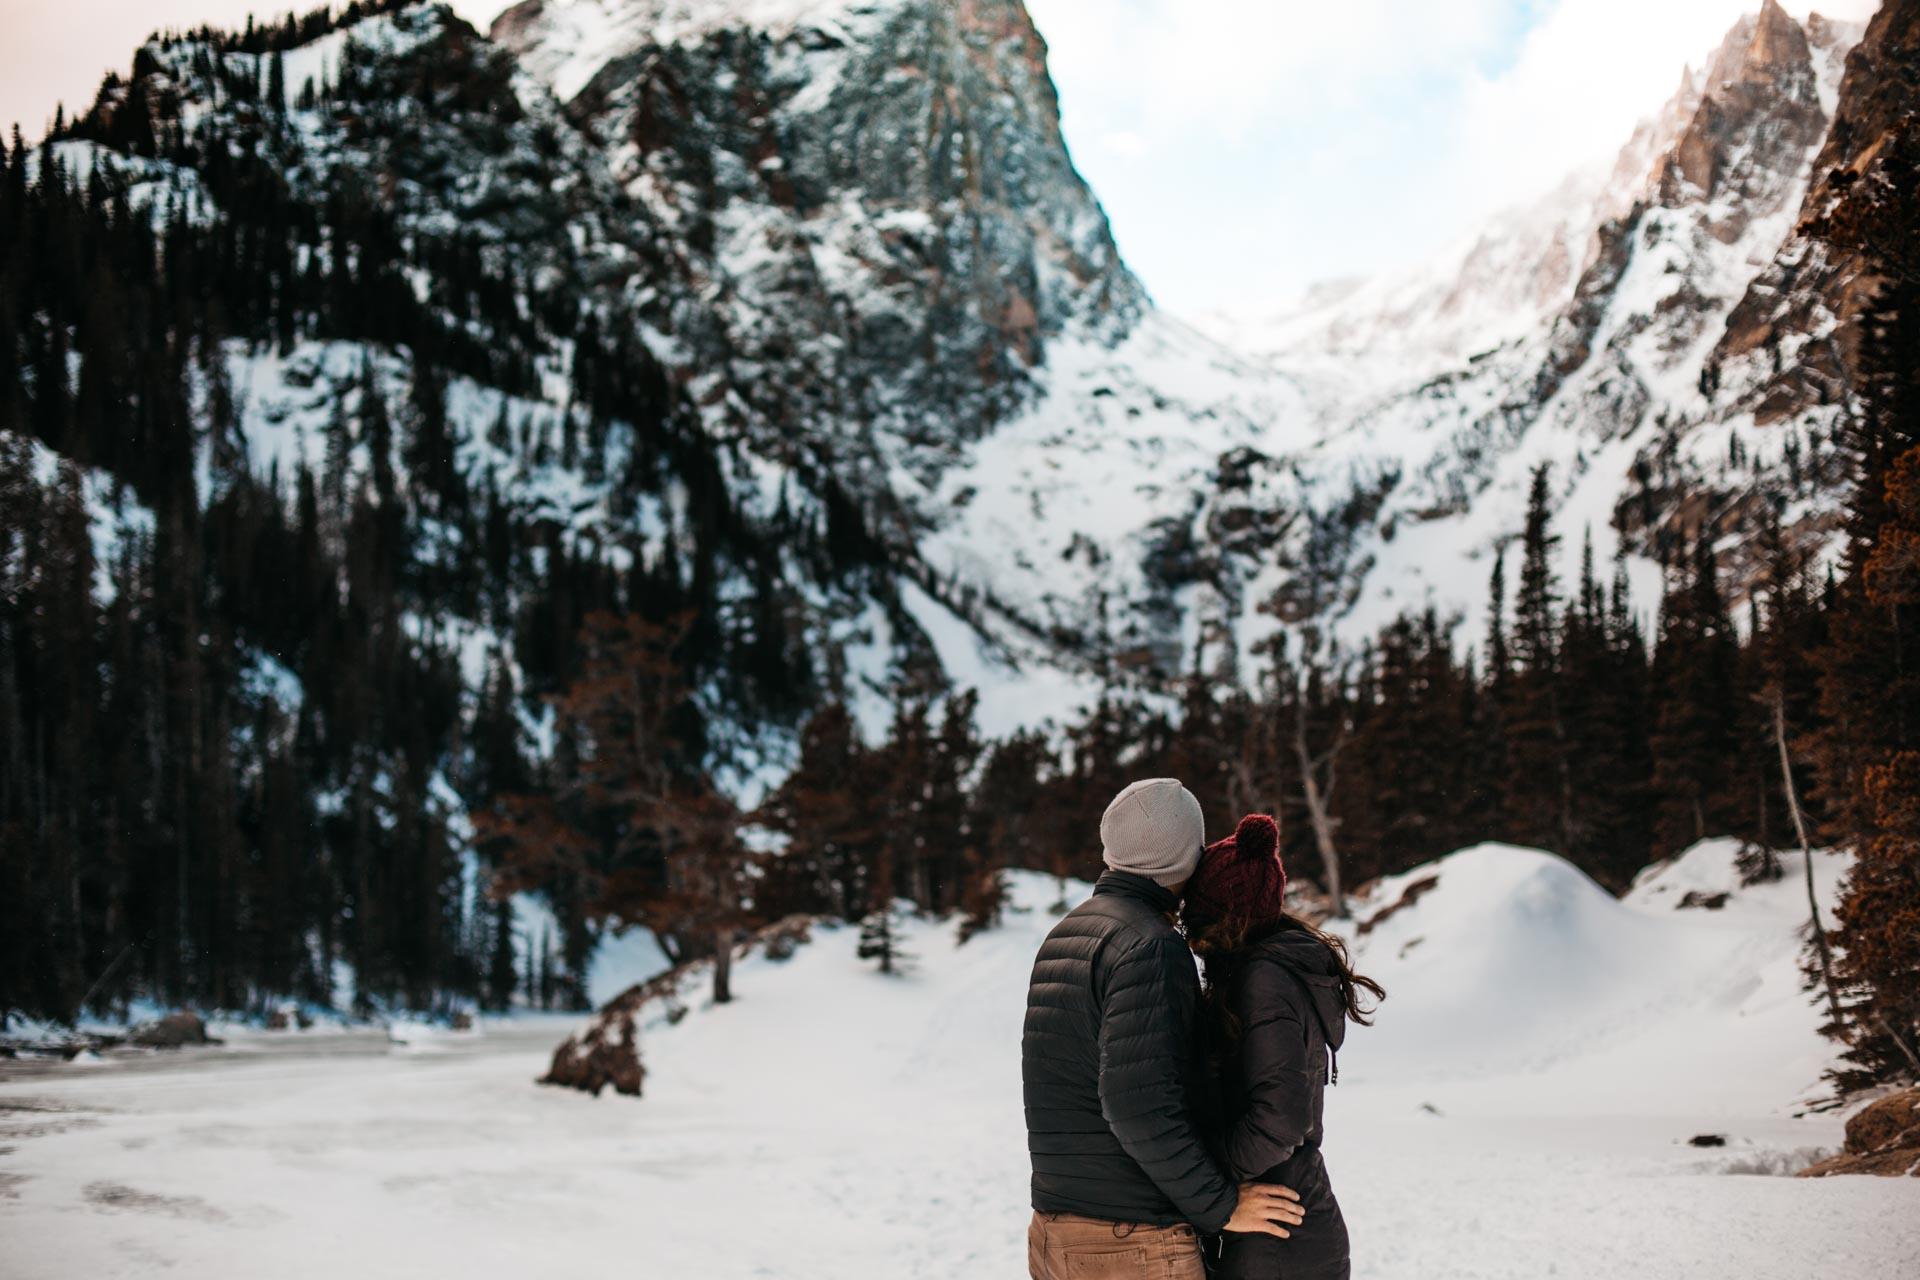 EngagementPhotographyRockyMountainNationalParkColorado (72 of 129).jpg